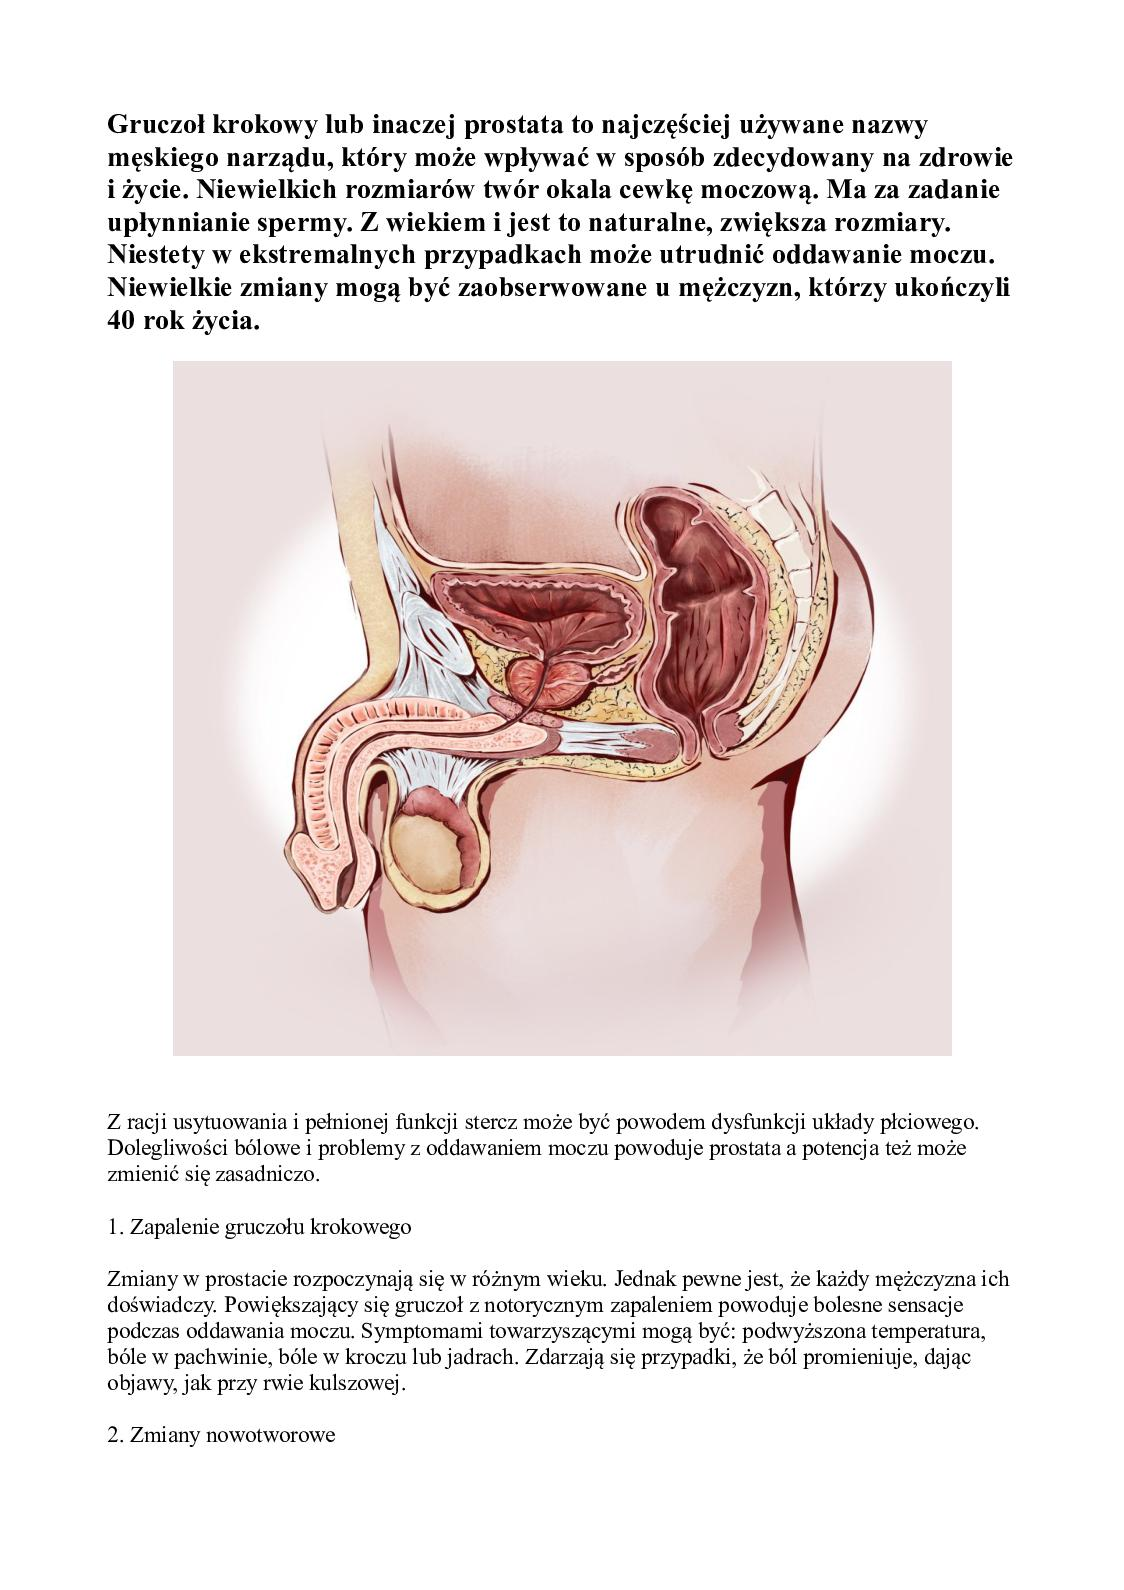 Prostata a potencja - zapalenia prostaty a słaba erekcja